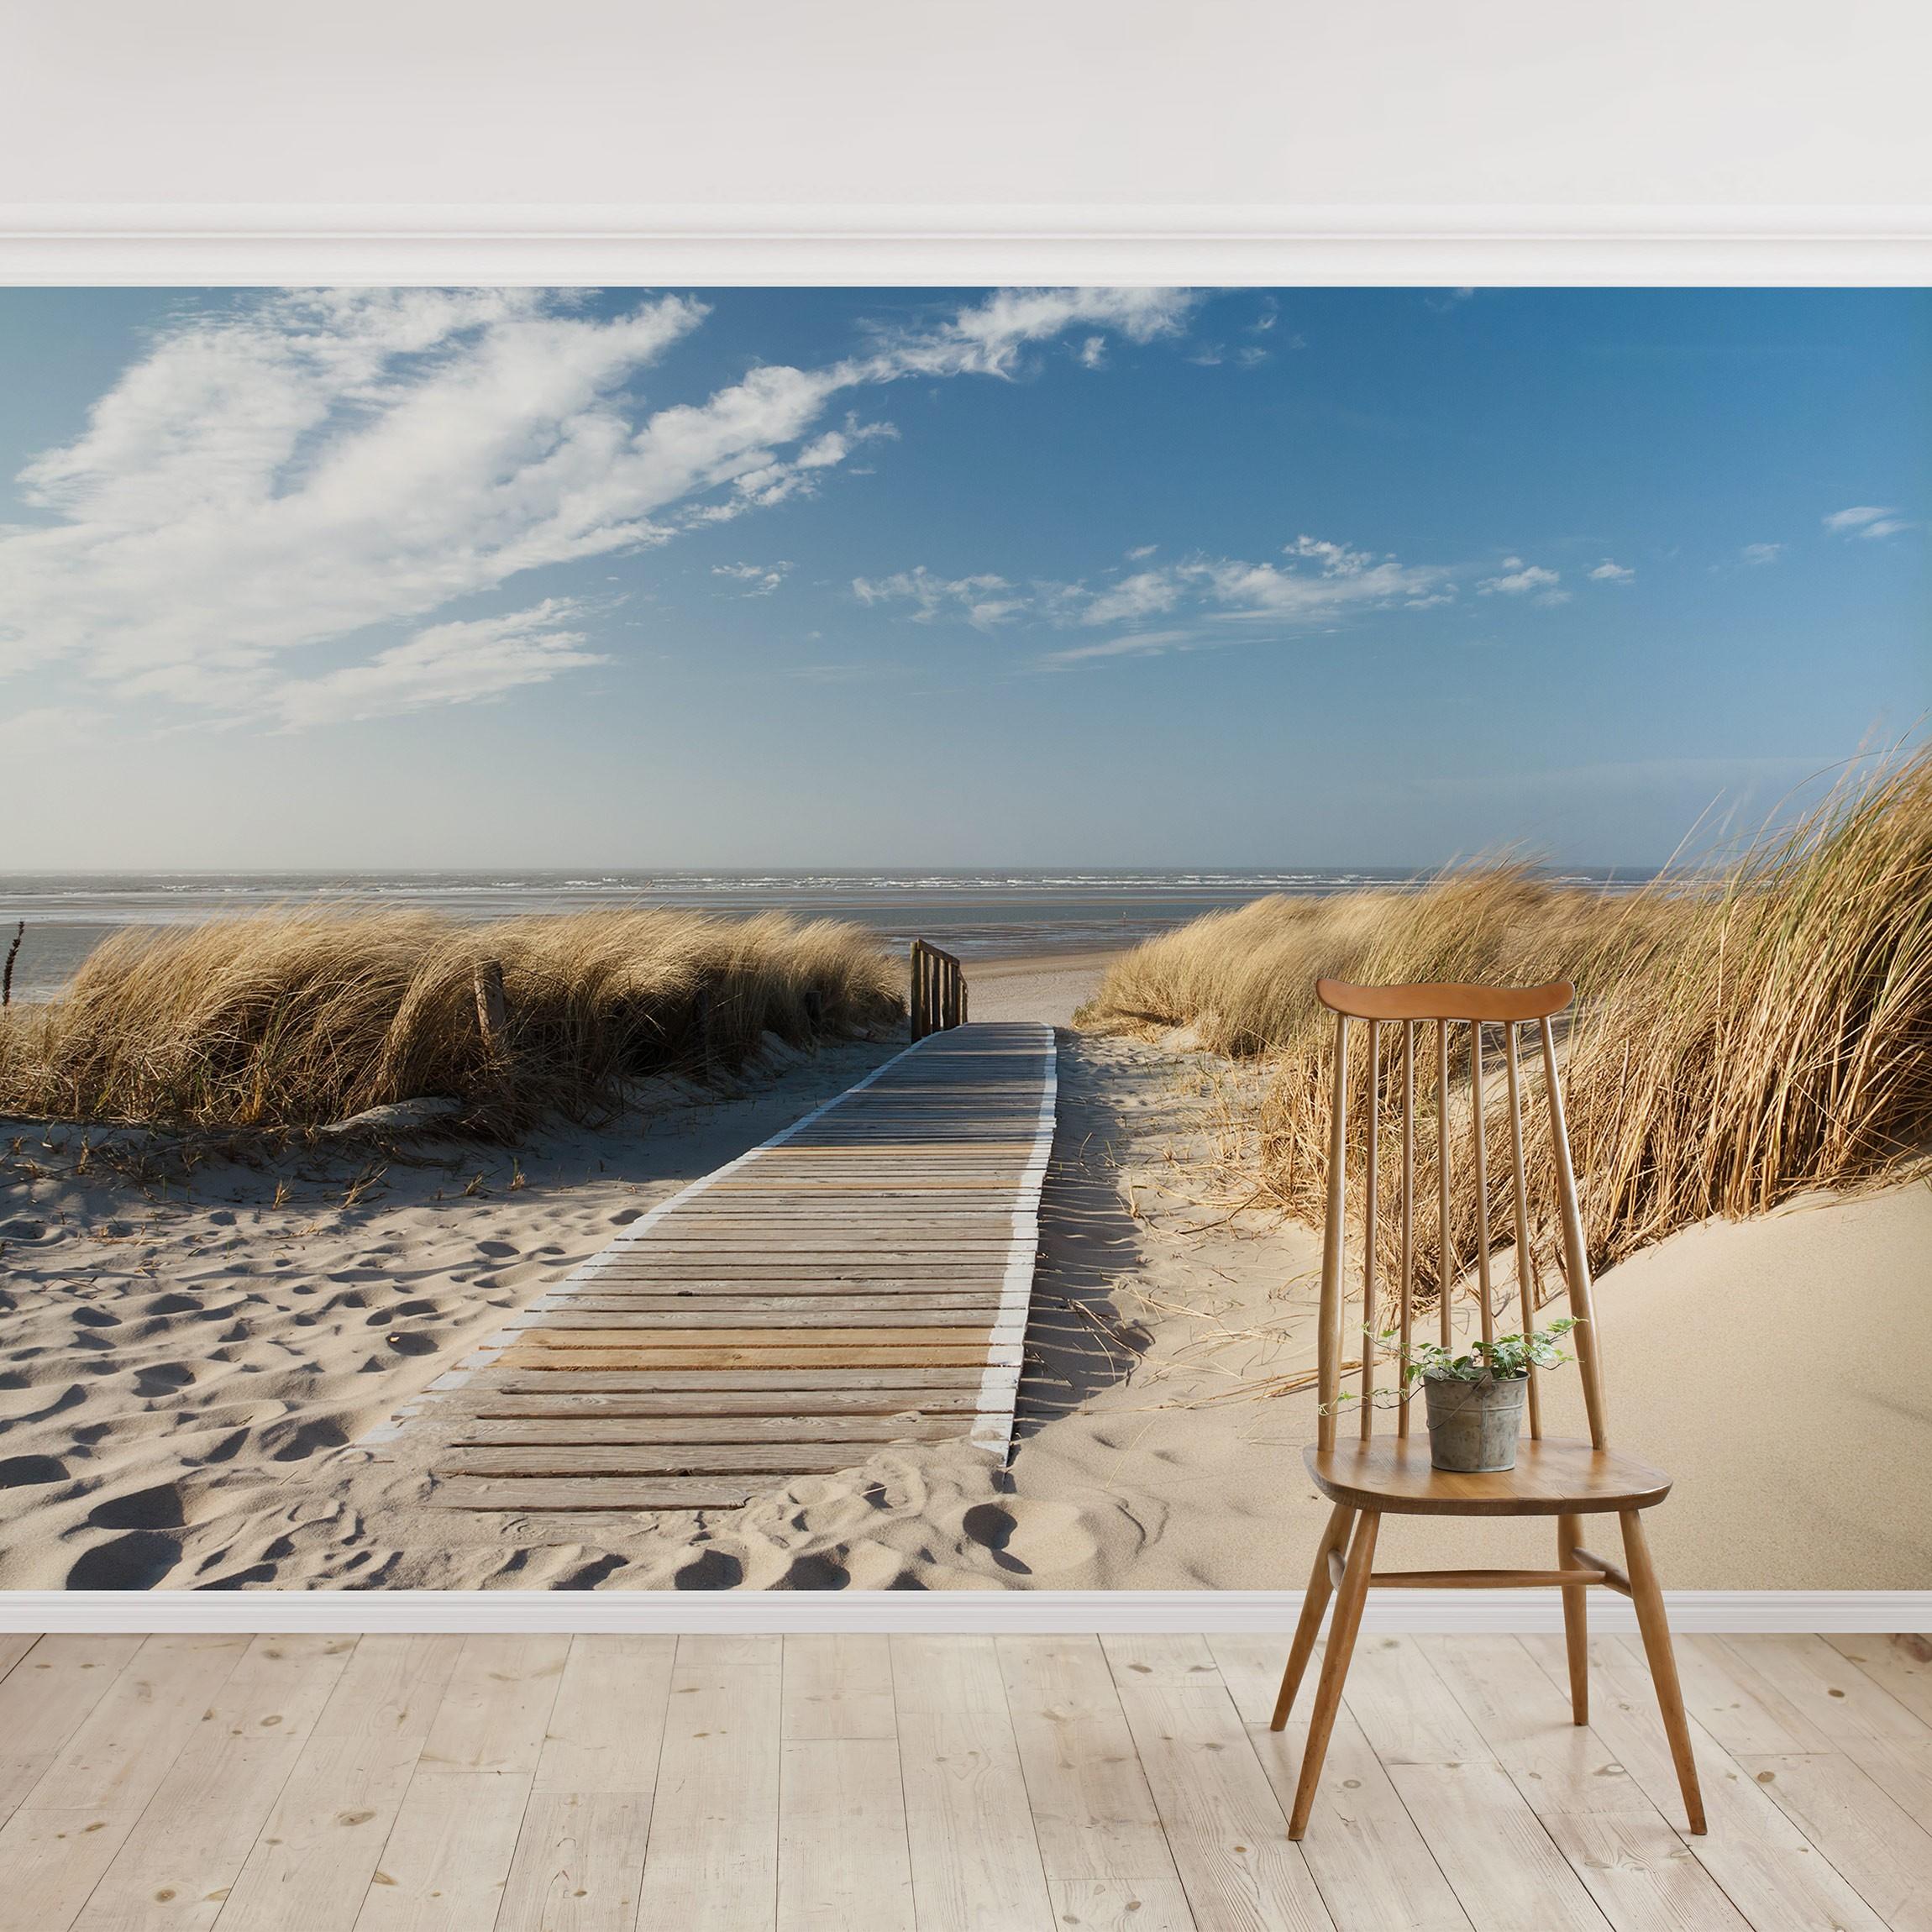 Fototapete Strand Ostsee : strand fototapete selbstklebend ostsee strand ~ Frokenaadalensverden.com Haus und Dekorationen